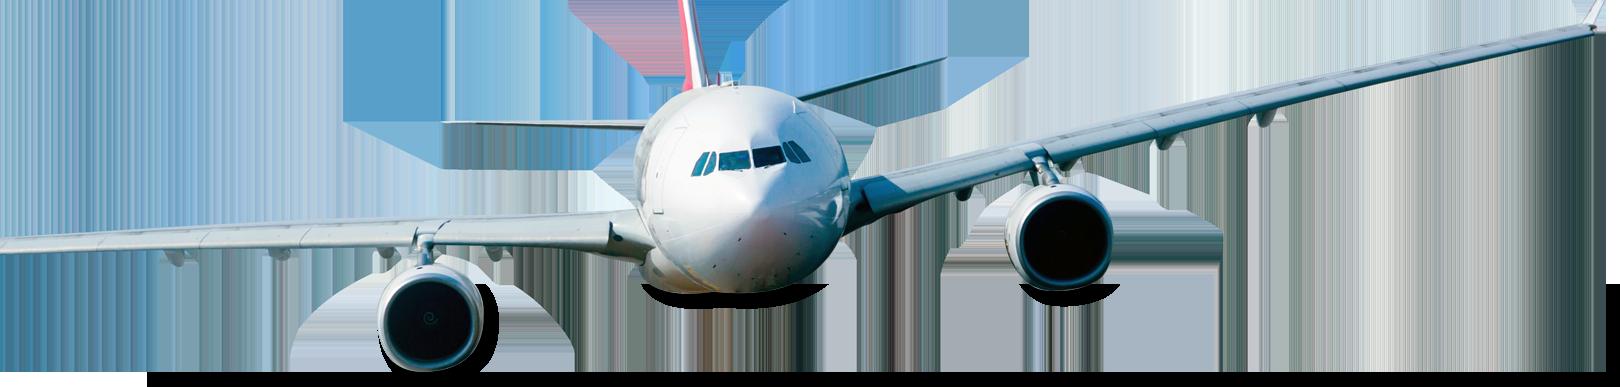 slide-1-airplane